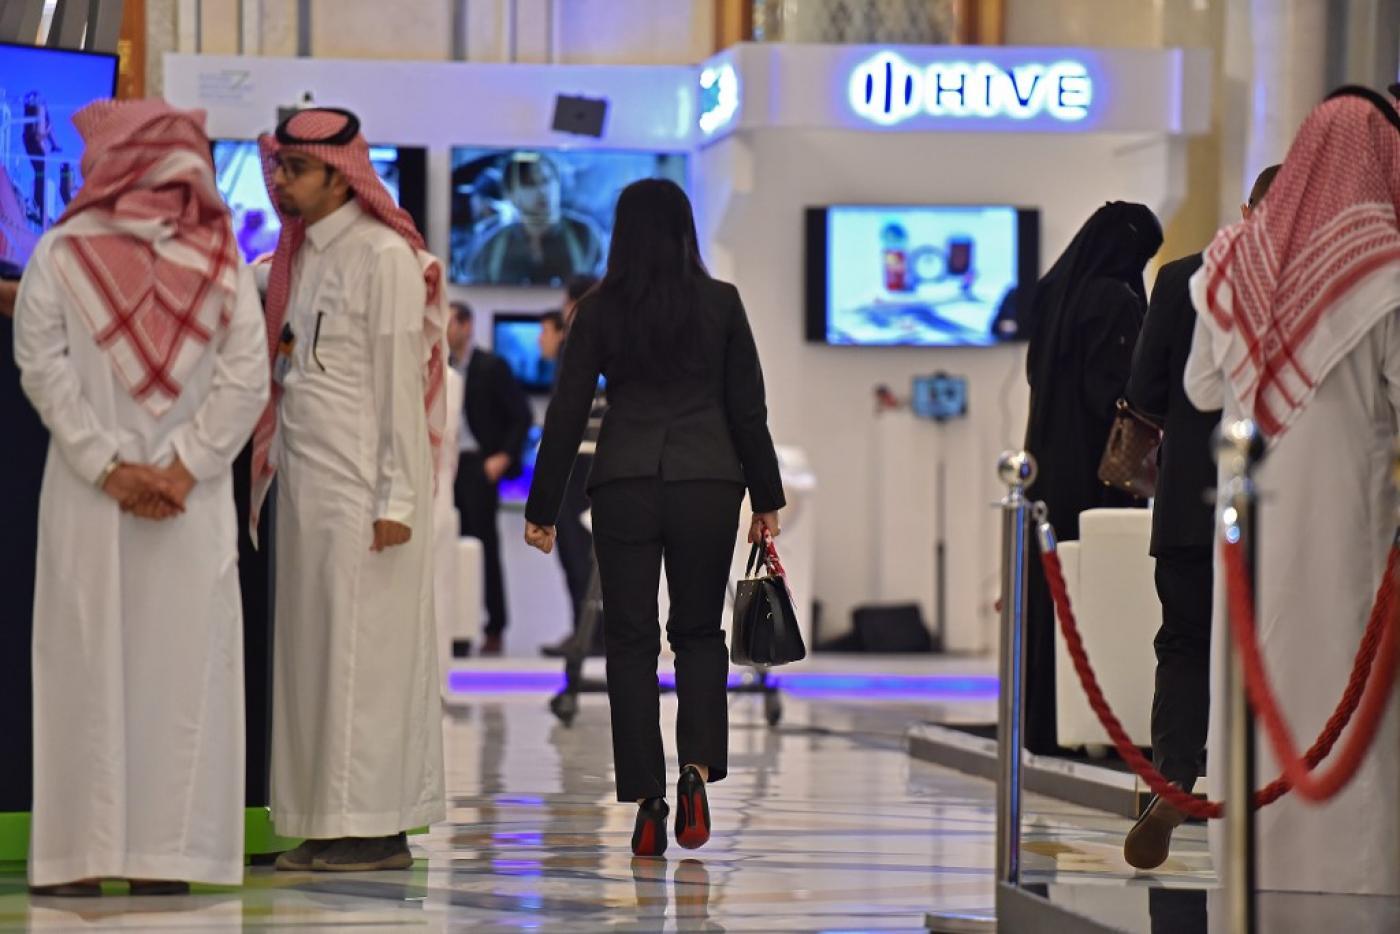 Will Feminism Be a Crime in Mohammed Bin Salman's Saudi Arabia?